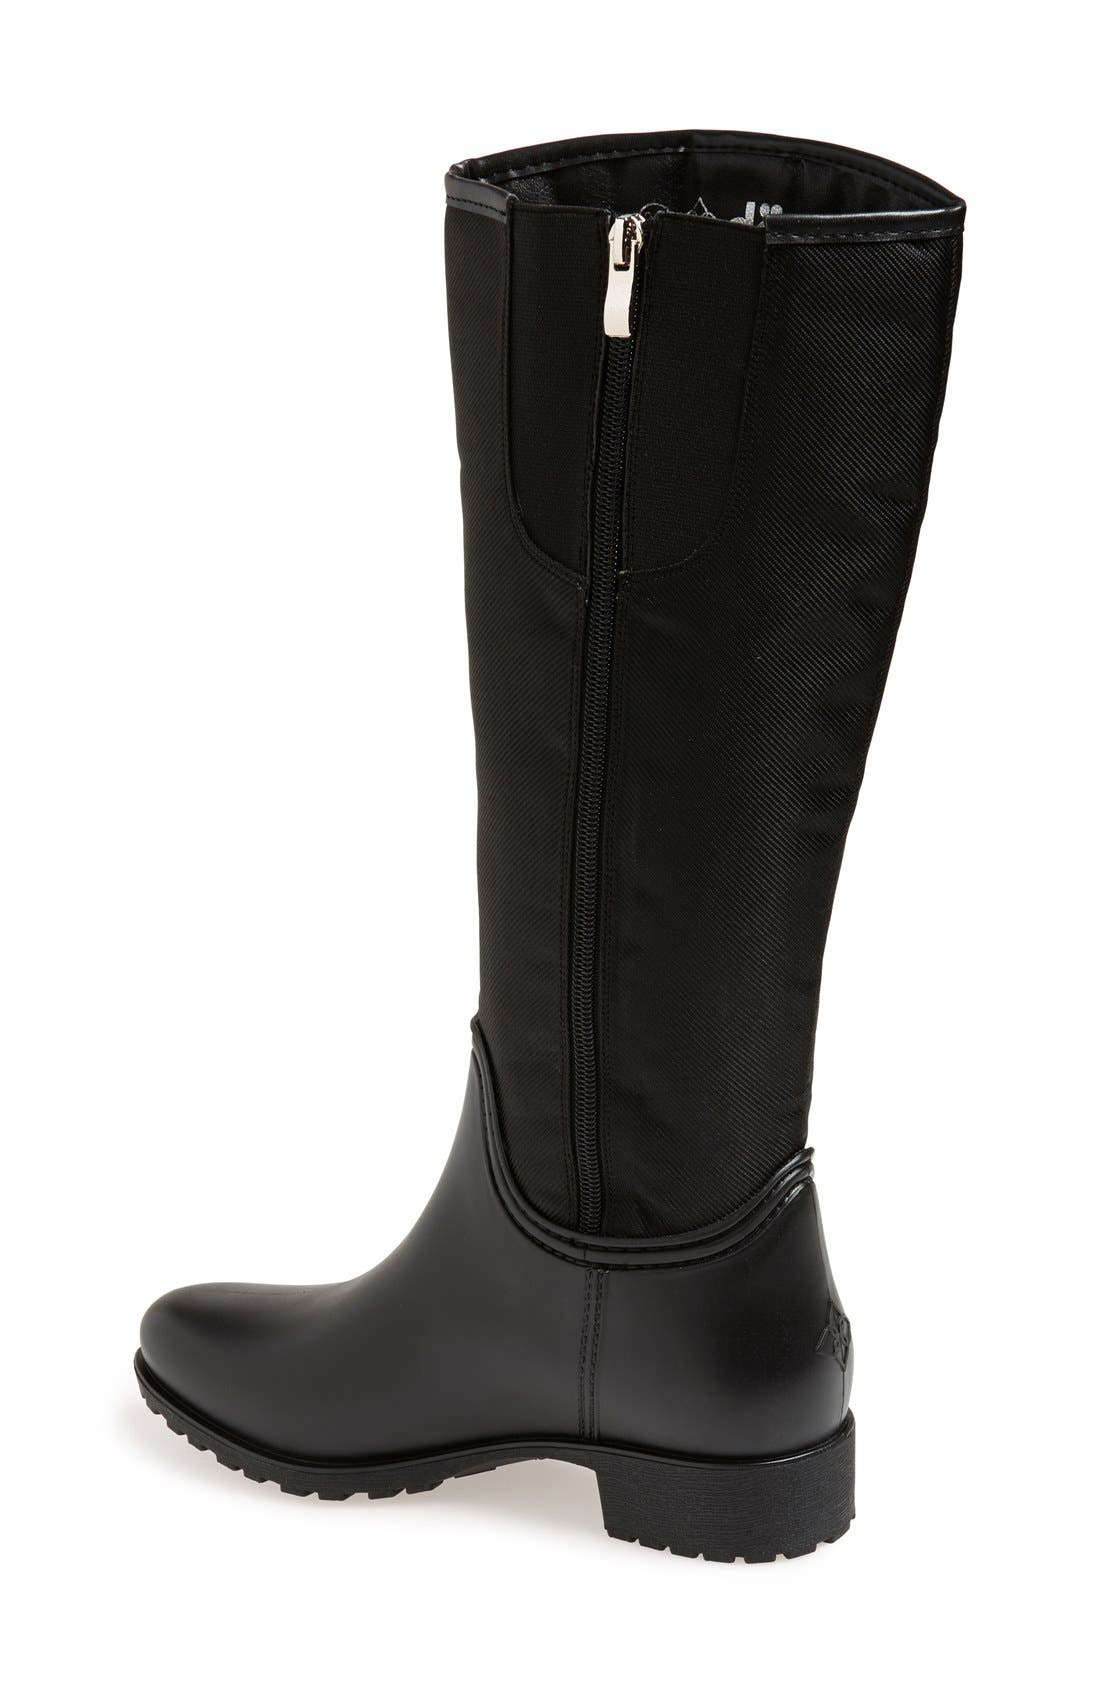 'Fairfield' Tall Rain Boot,                             Alternate thumbnail 2, color,                             006